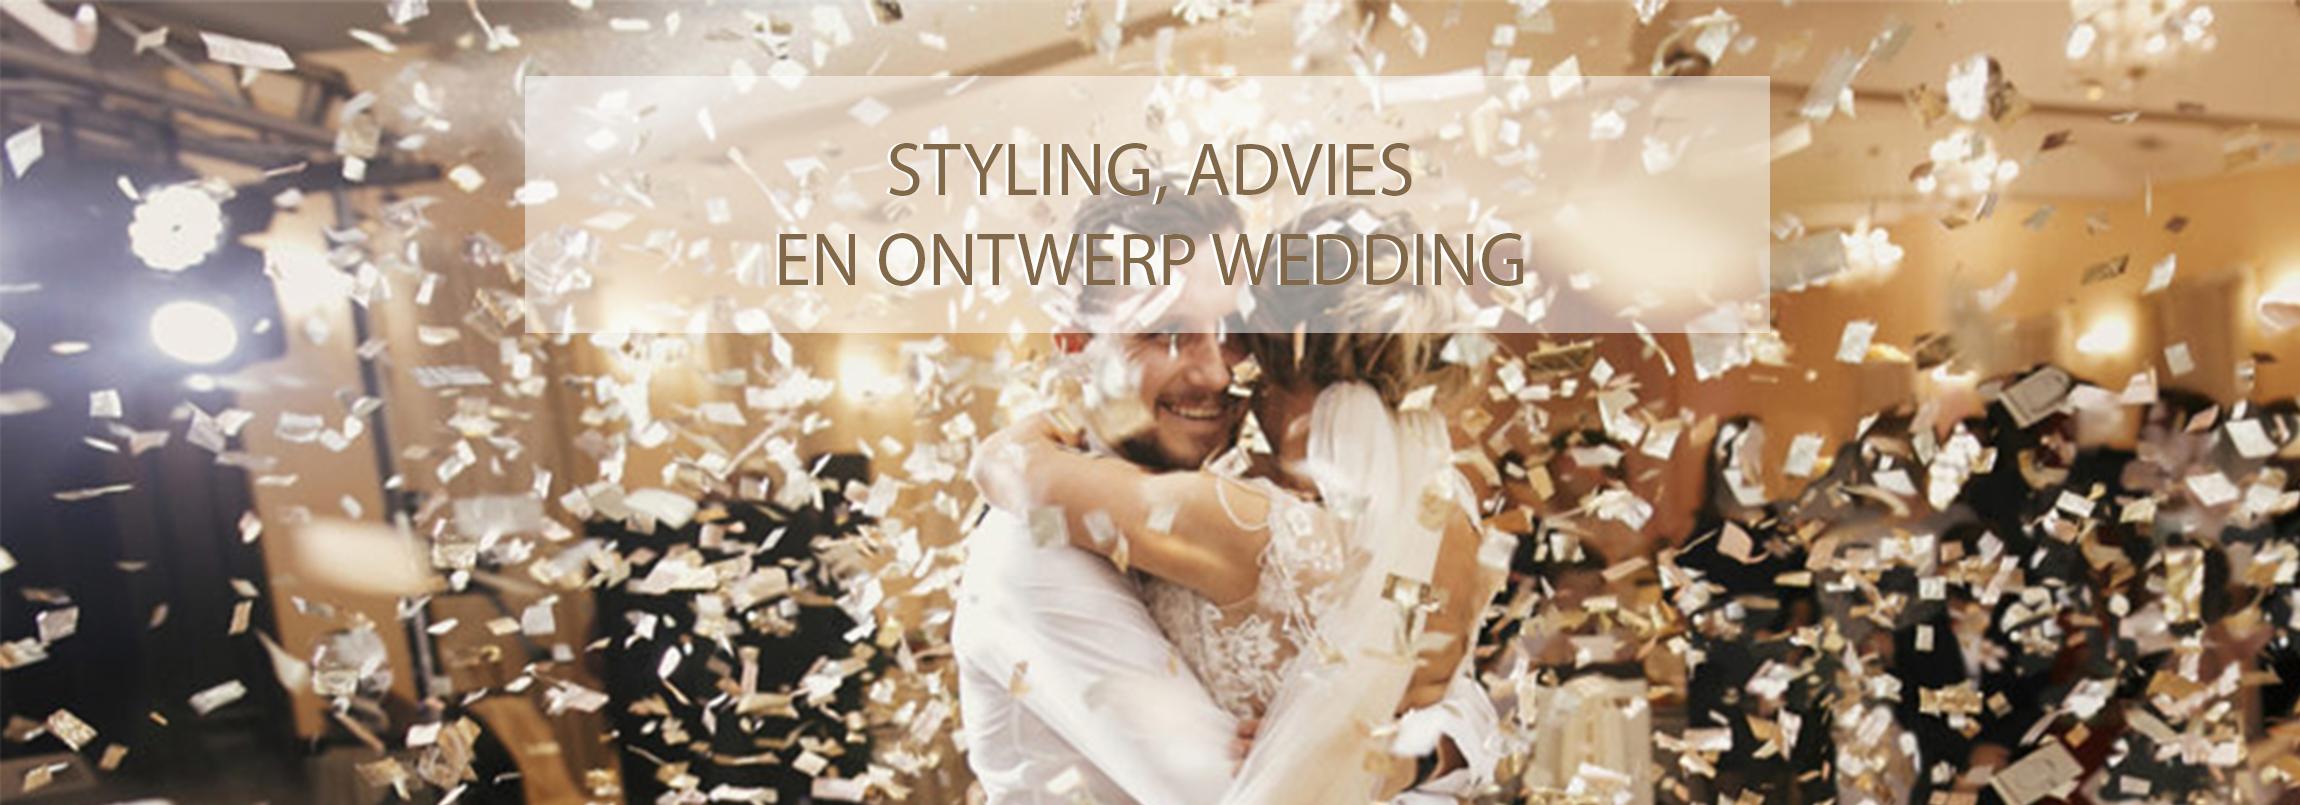 styling advies en ontwerp wedding bruiloften